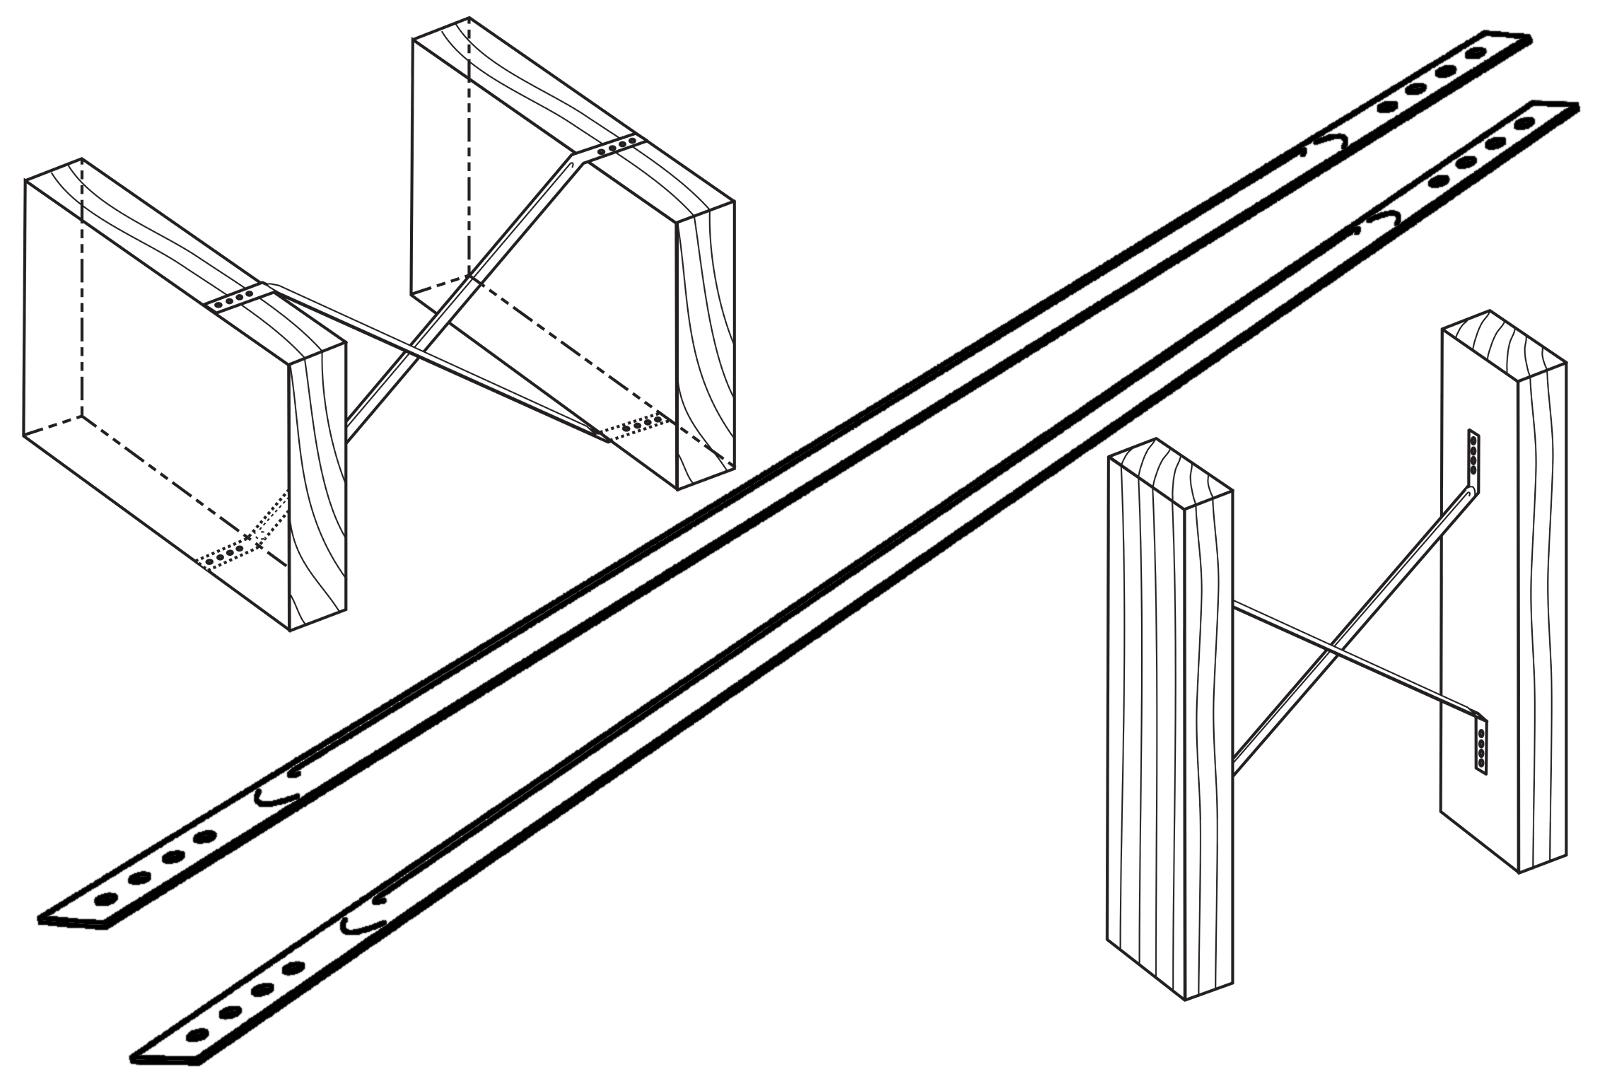 Pinquist Metal Building Supplies Floor Anchors Joist